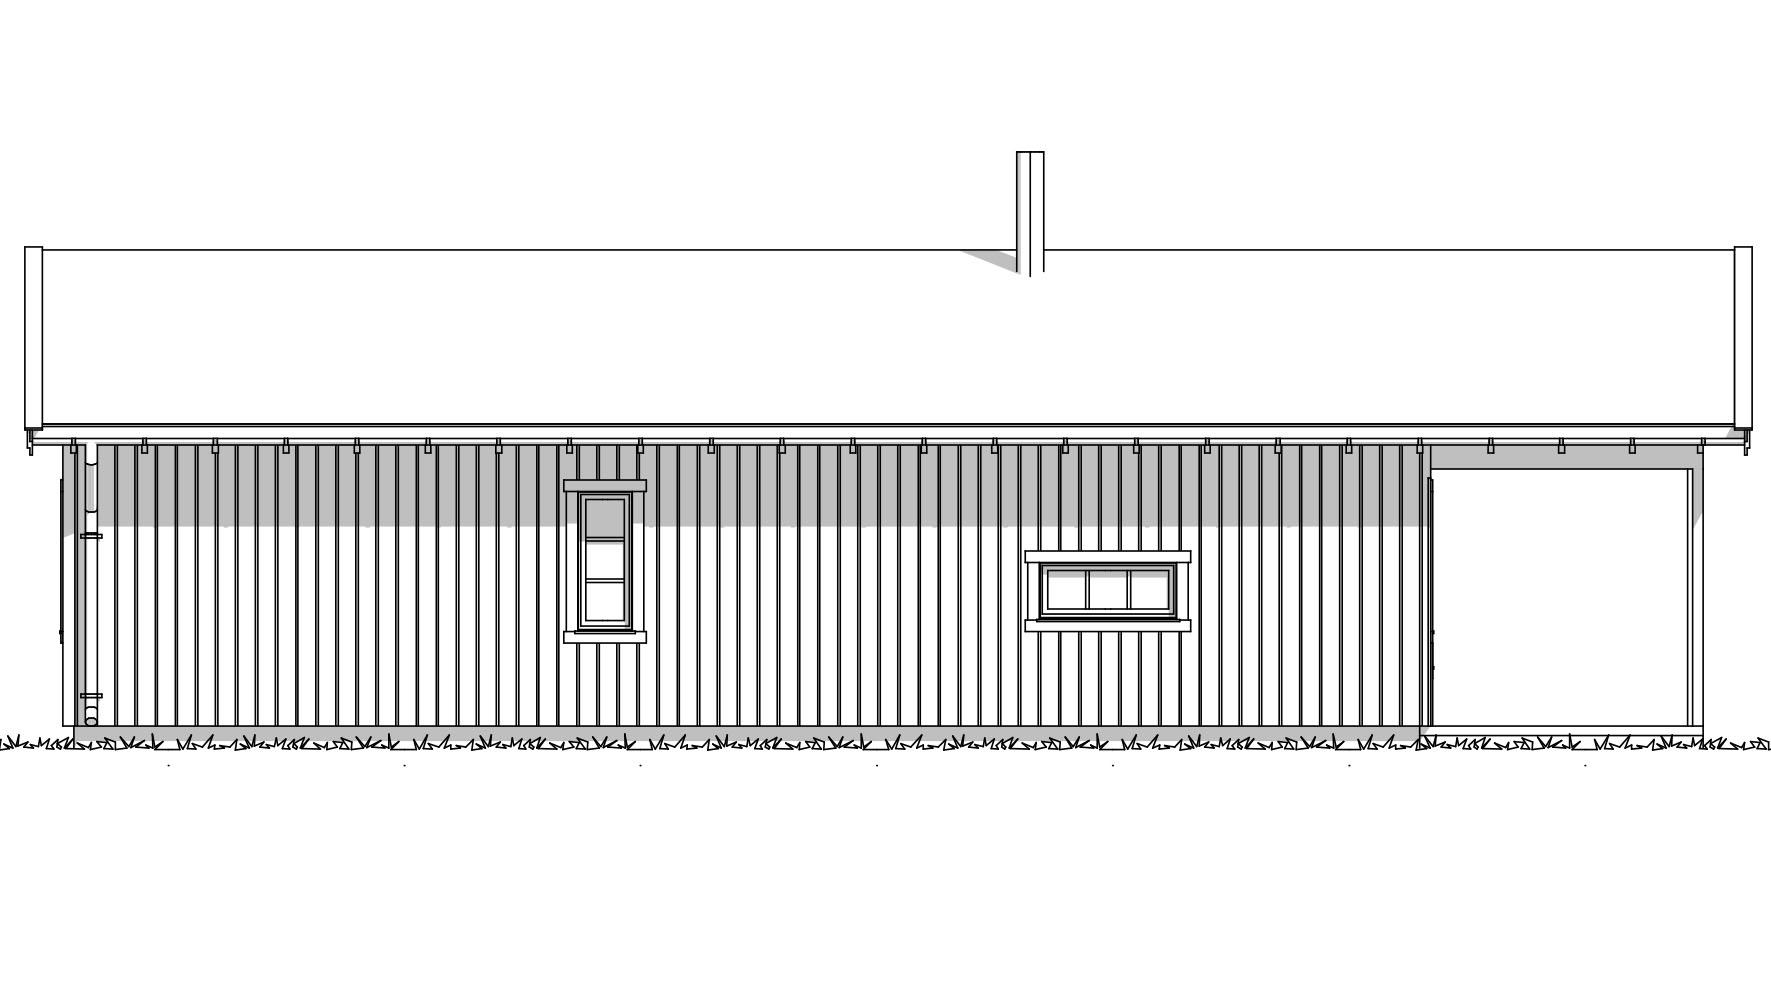 16-Koia+tradisjon+fasade+1+katalog.jpg